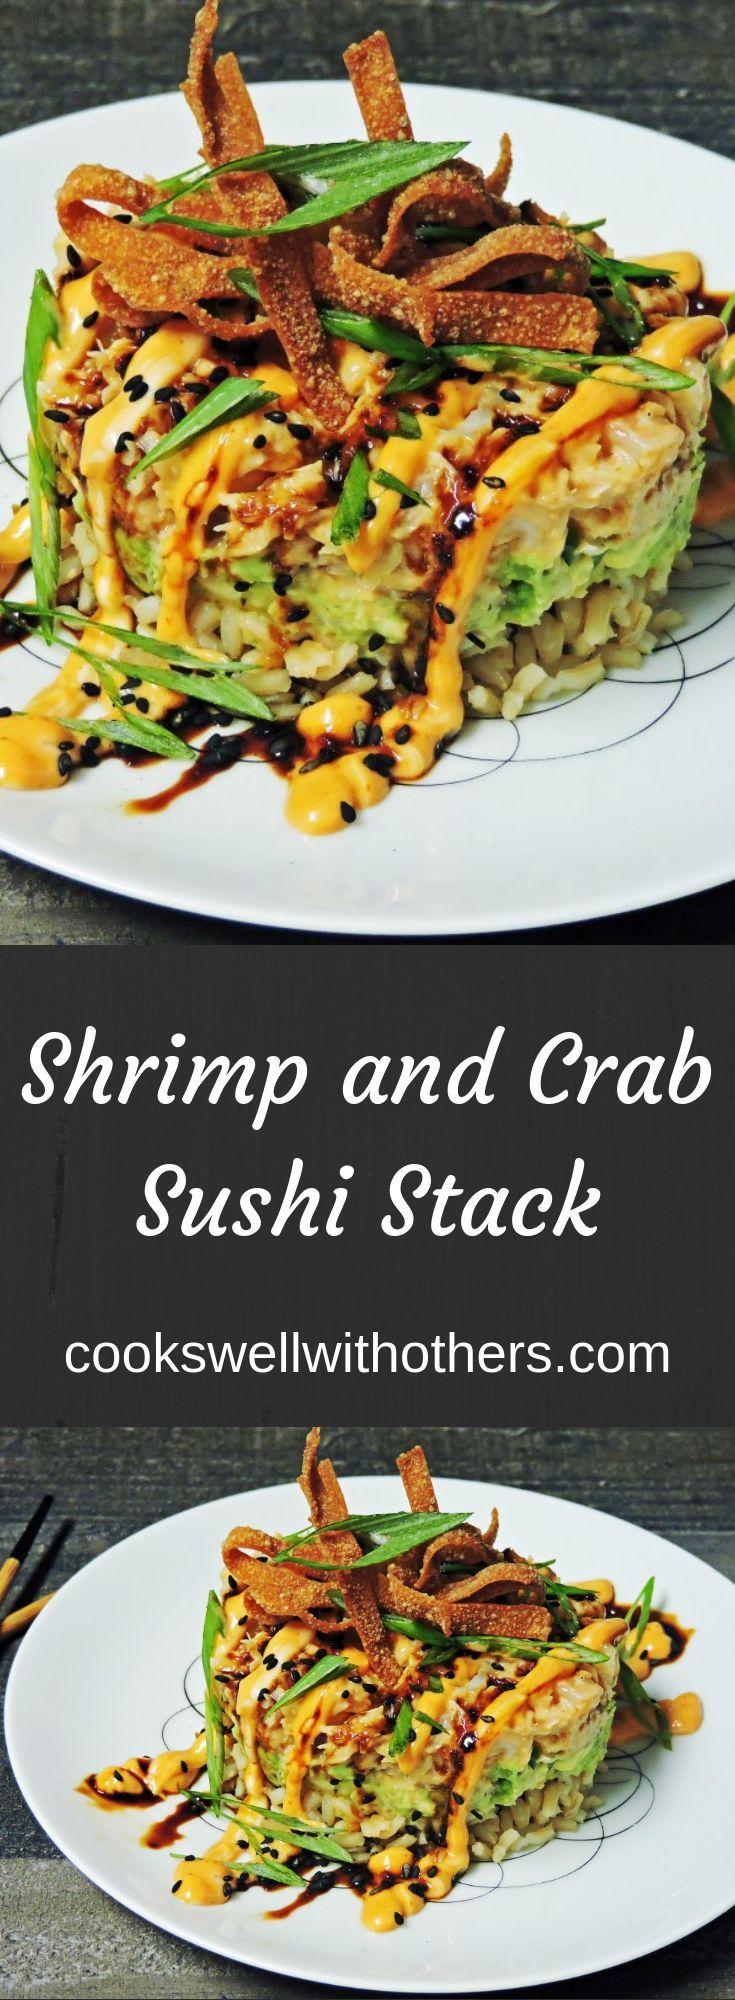 Shrimp and Crab Sushi Stack – #CRAB #Shrimp #Stack…